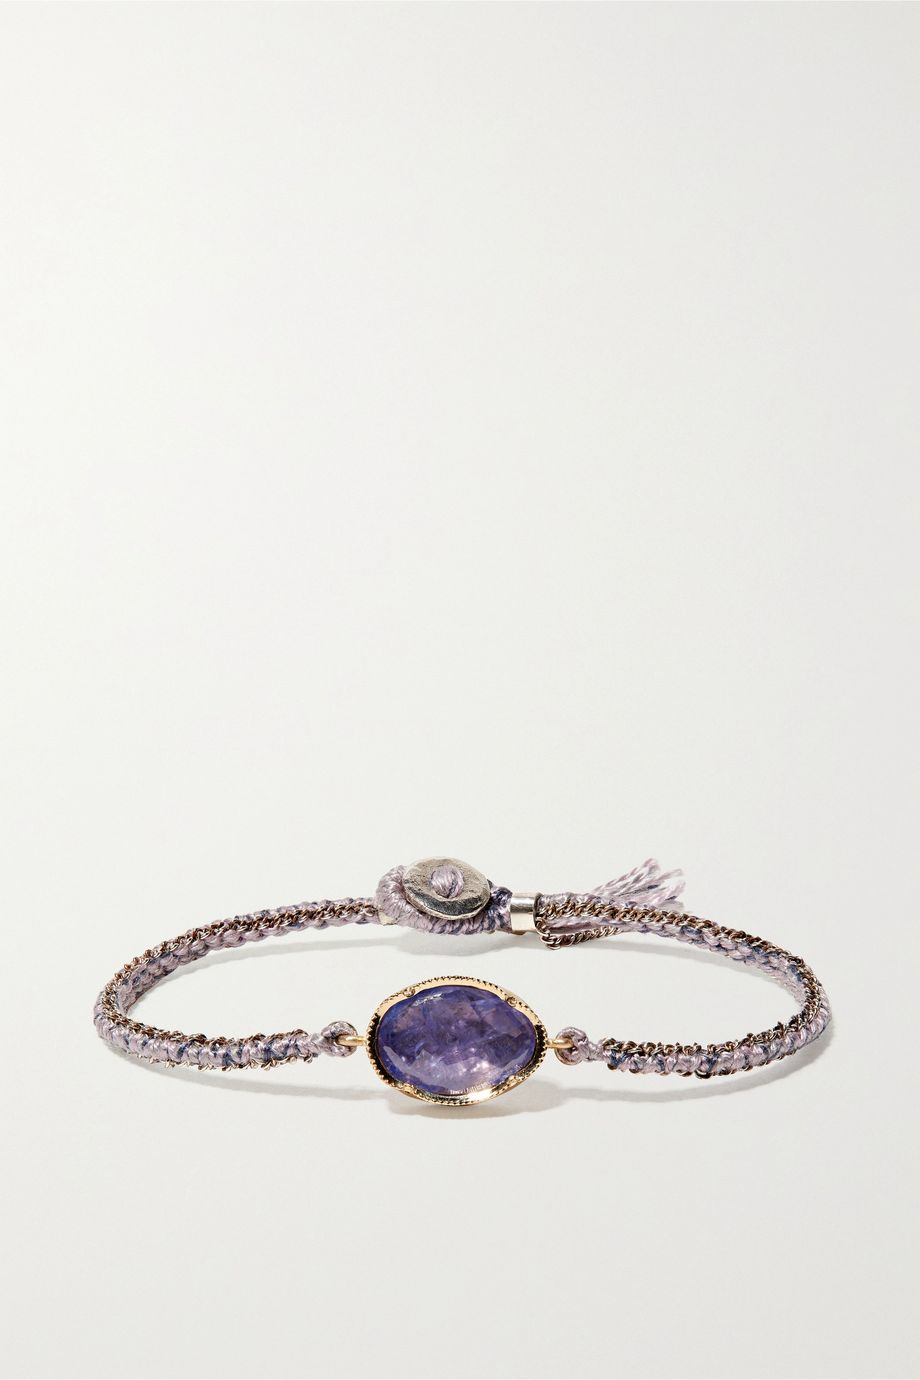 Brooke Gregson Orbit 14-karat gold, sterling silver, silk and tanzanite bracelet